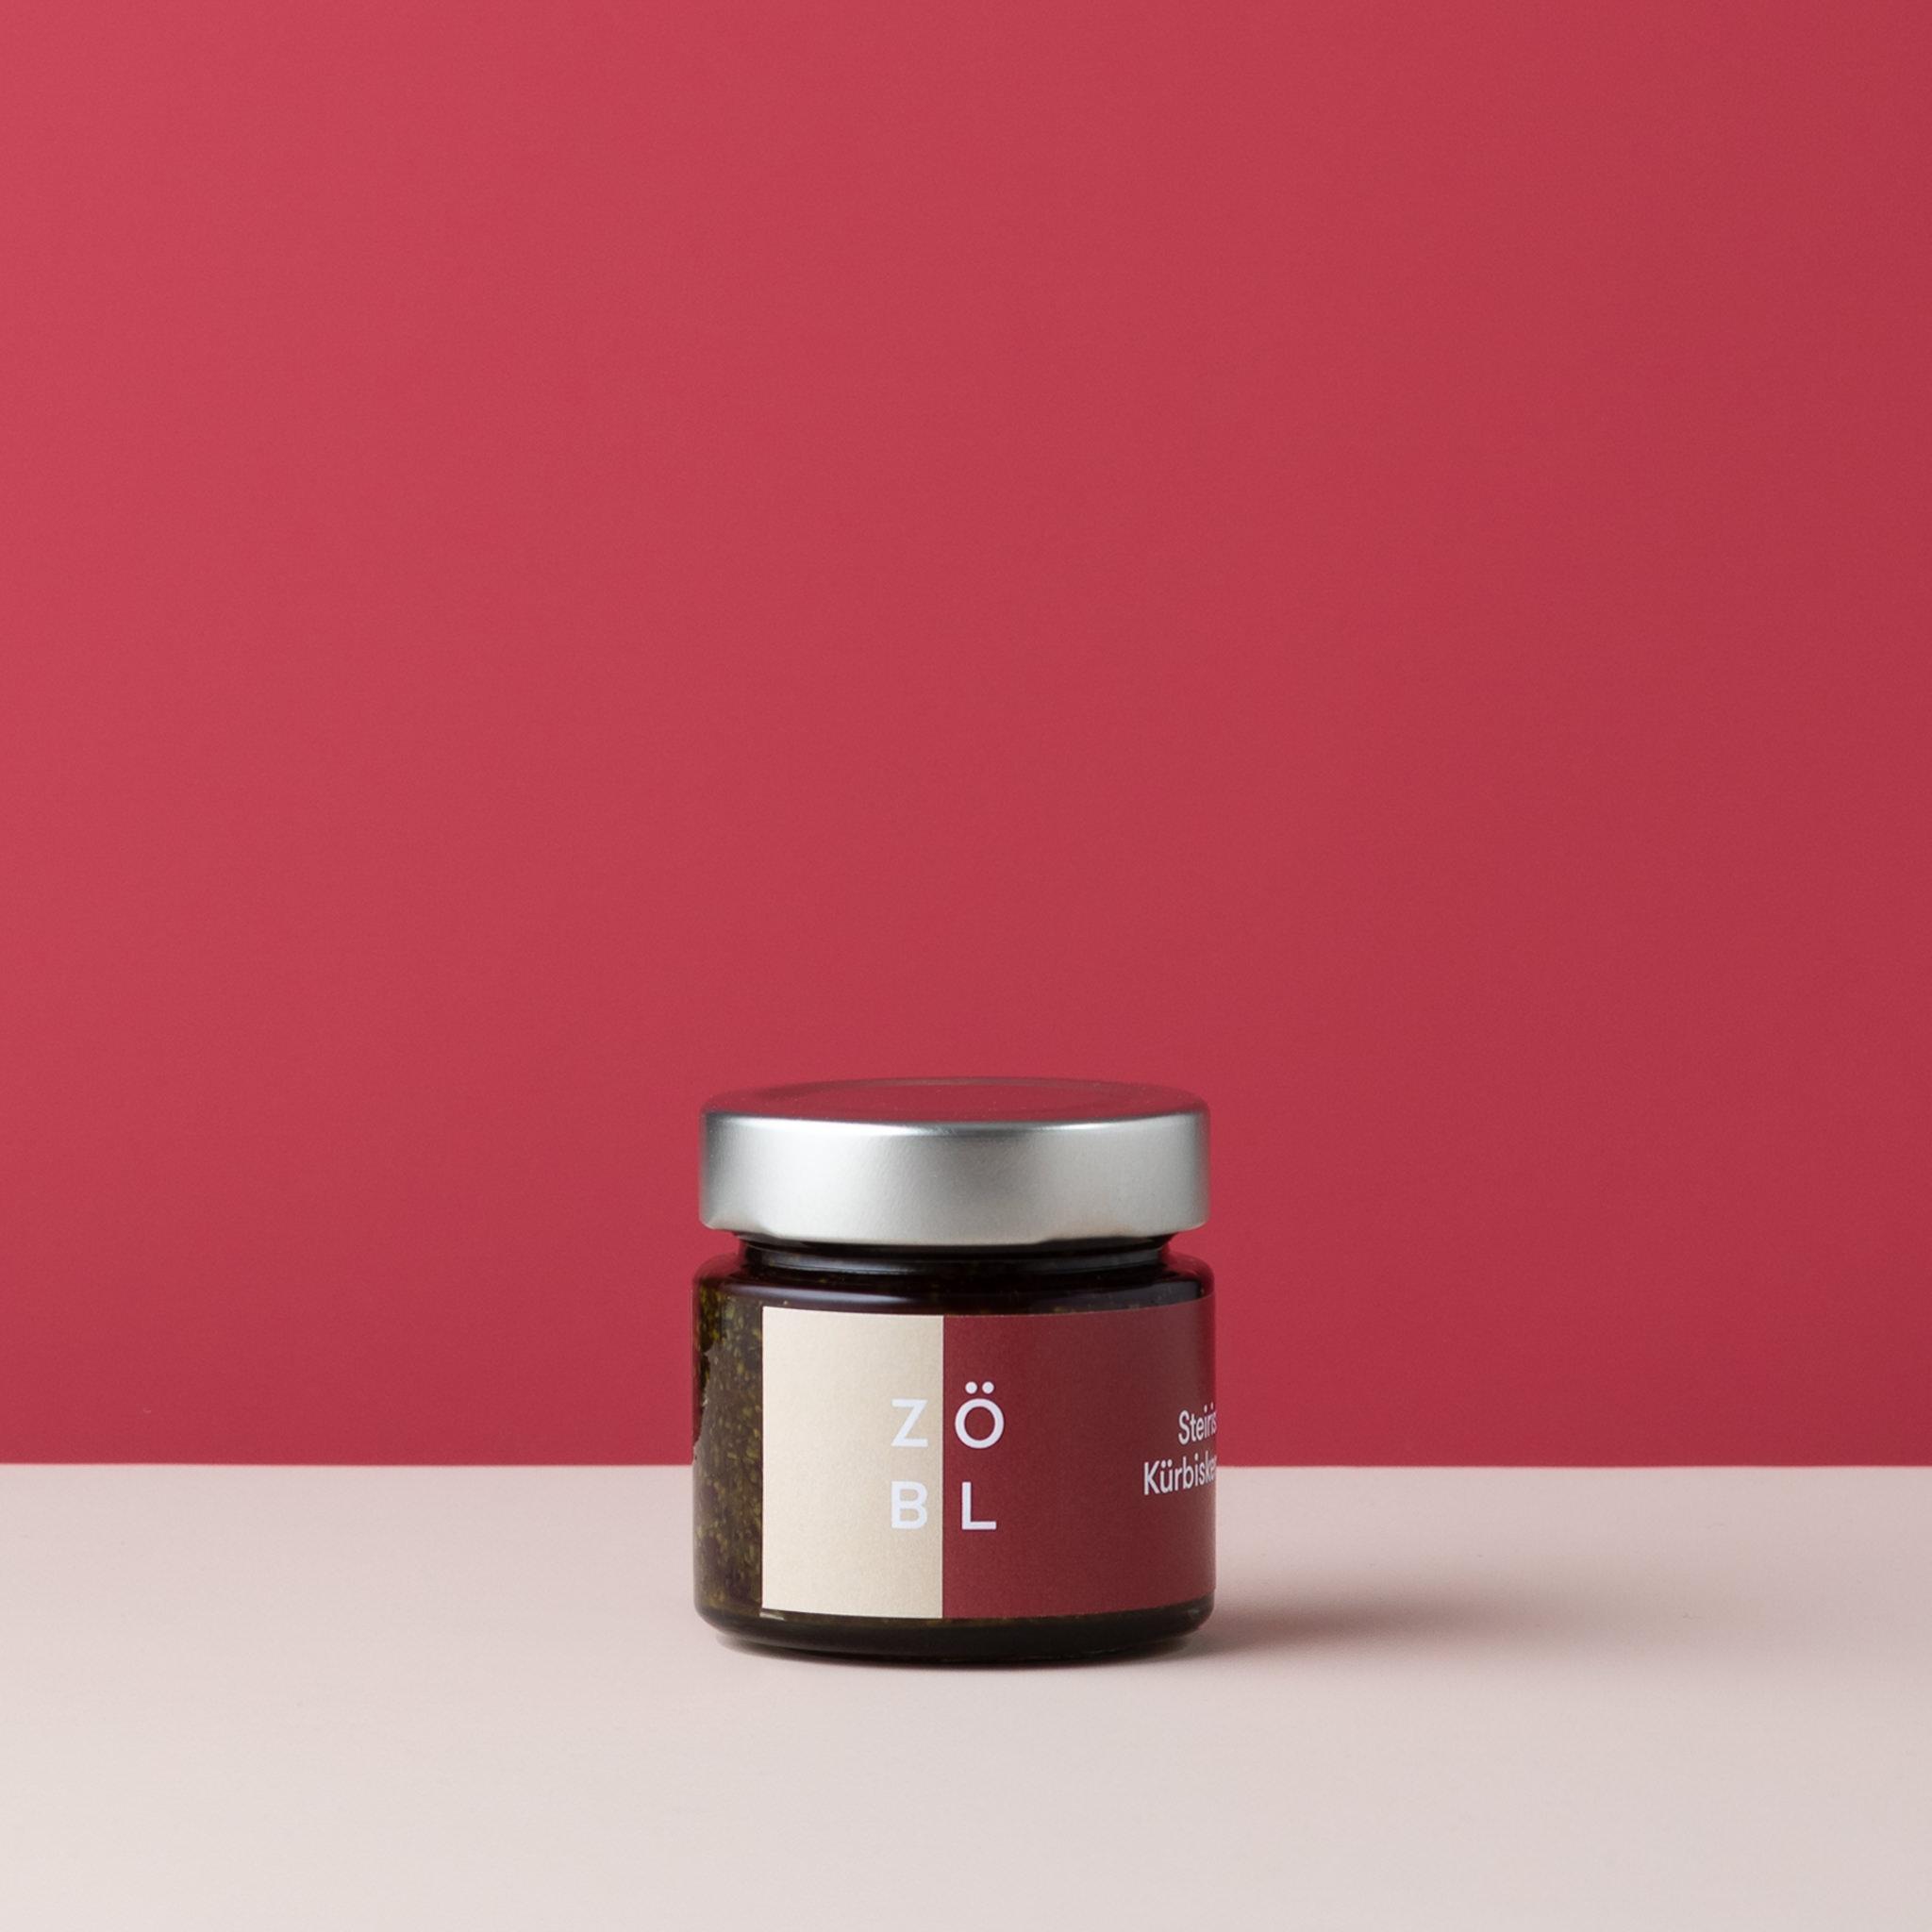 Zöbl Kernöl Produktfotografie-3